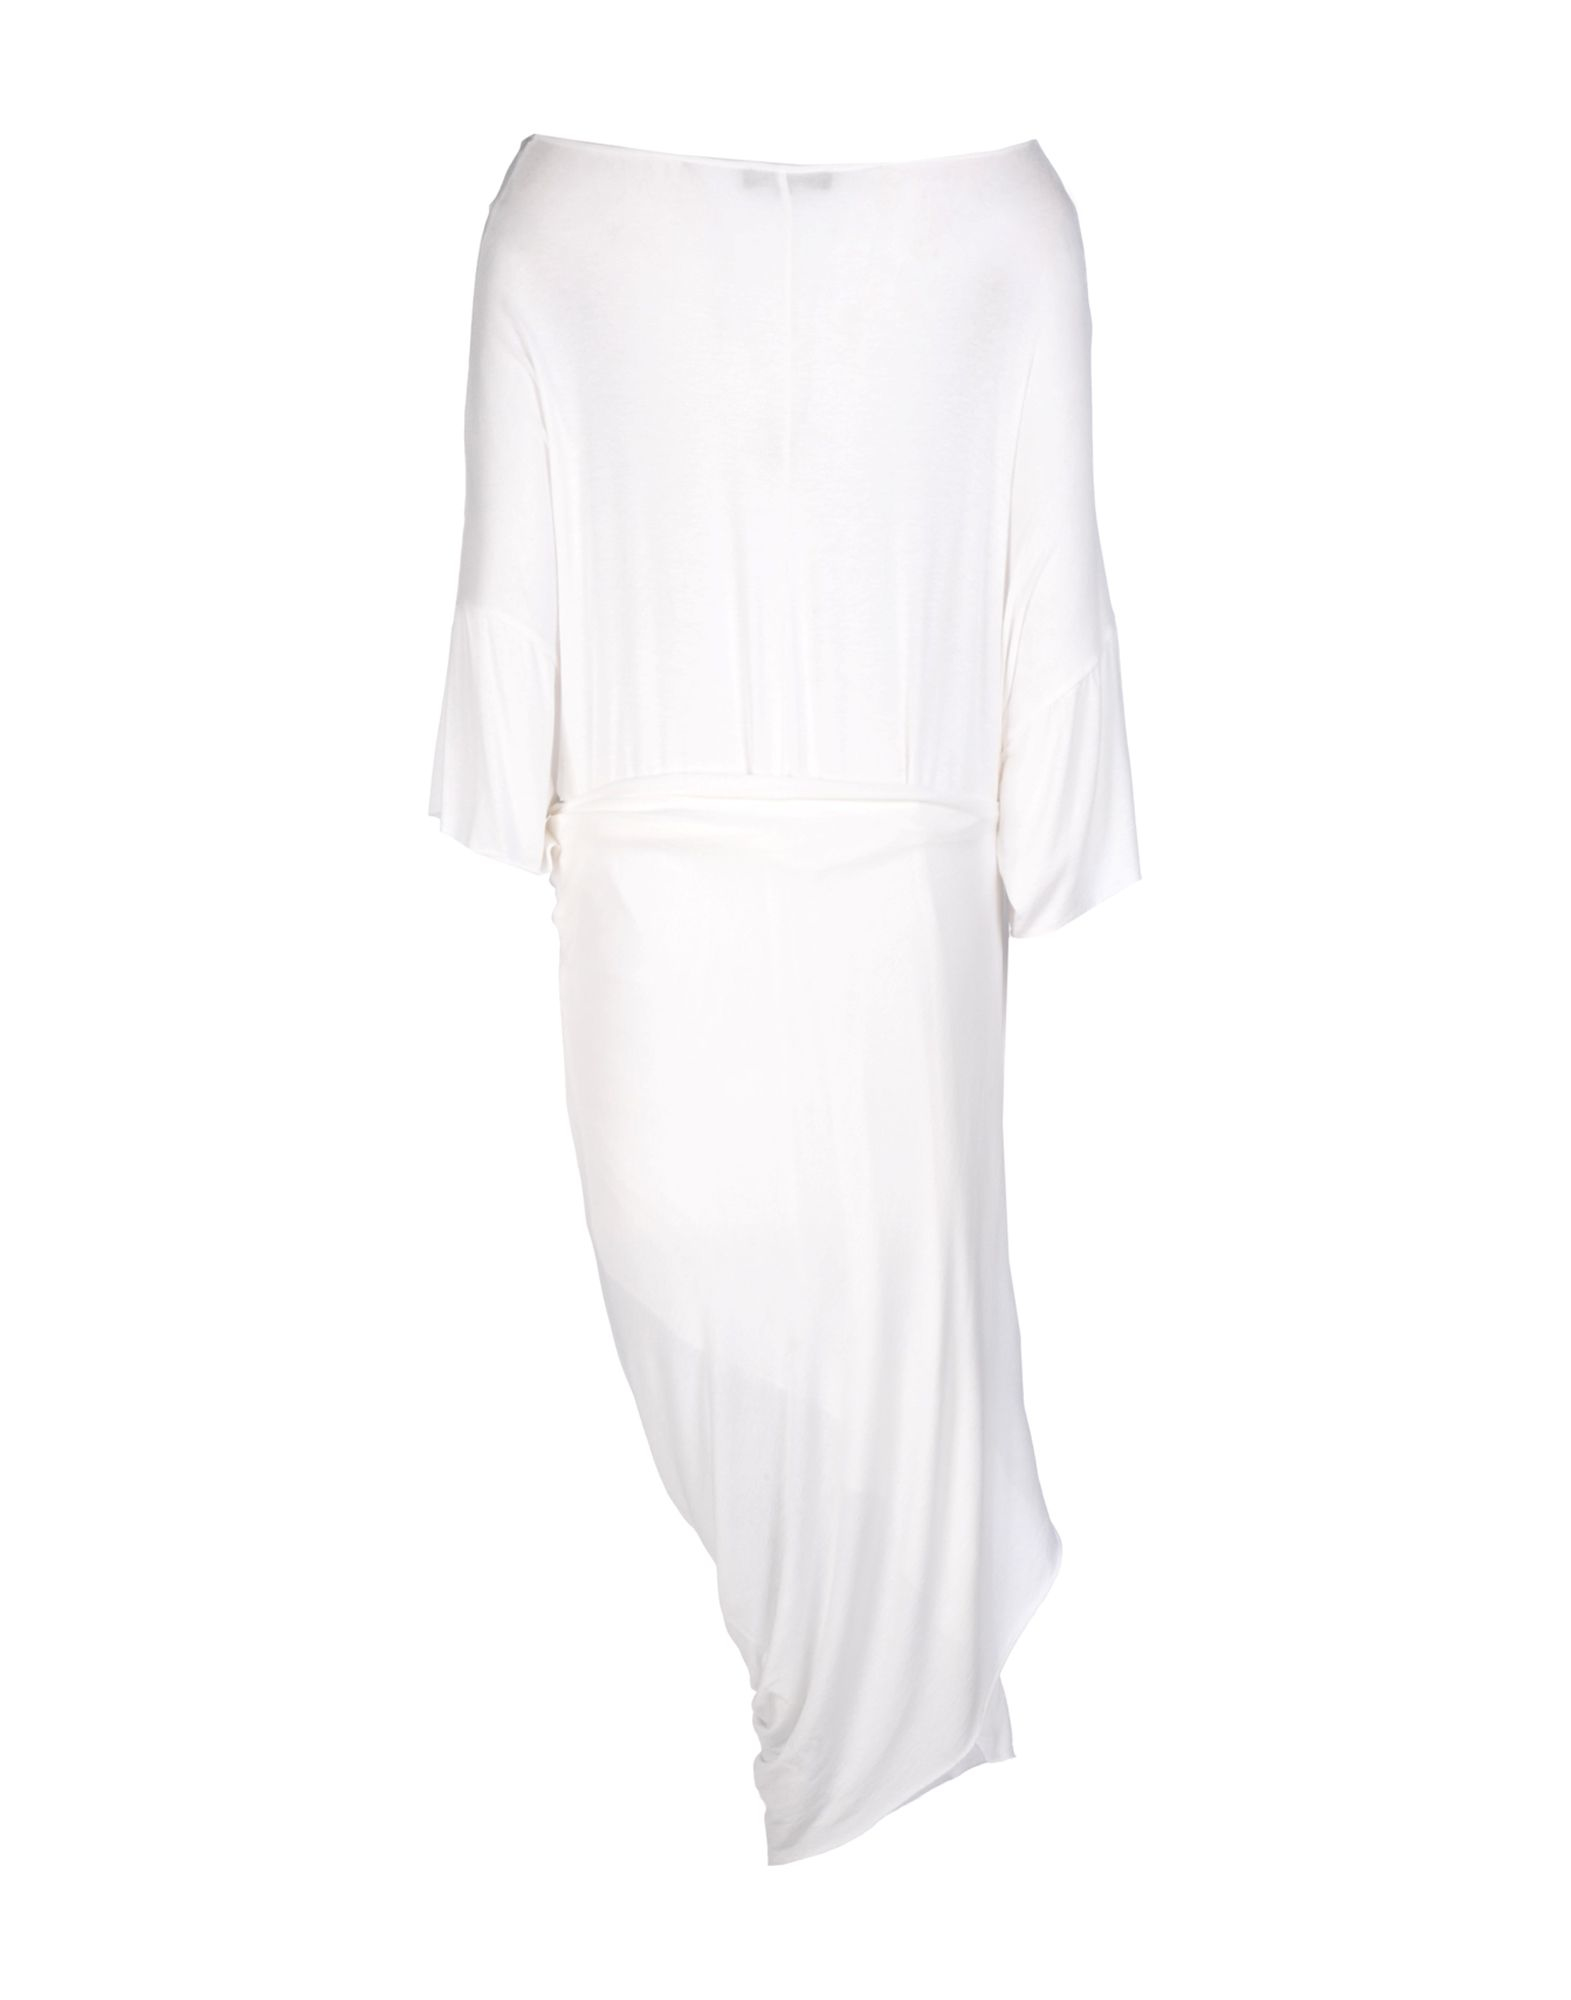 Mariagrazia Panizzi 3 4 Length Dress In White Lyst